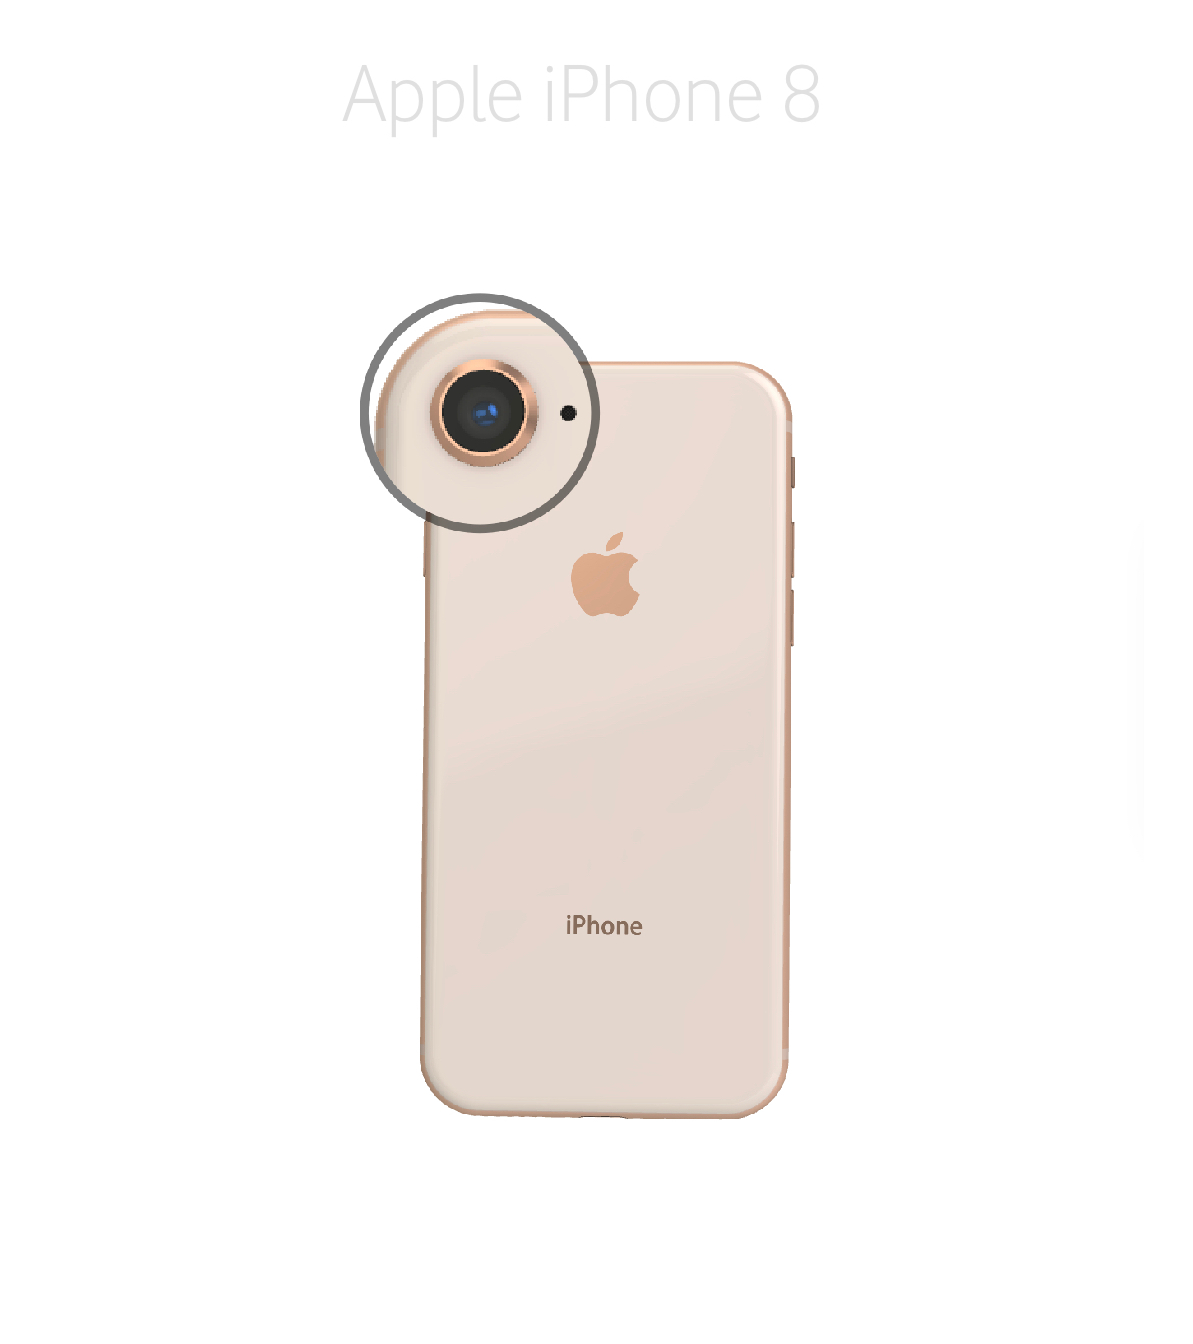 Laga kamera iphone 8